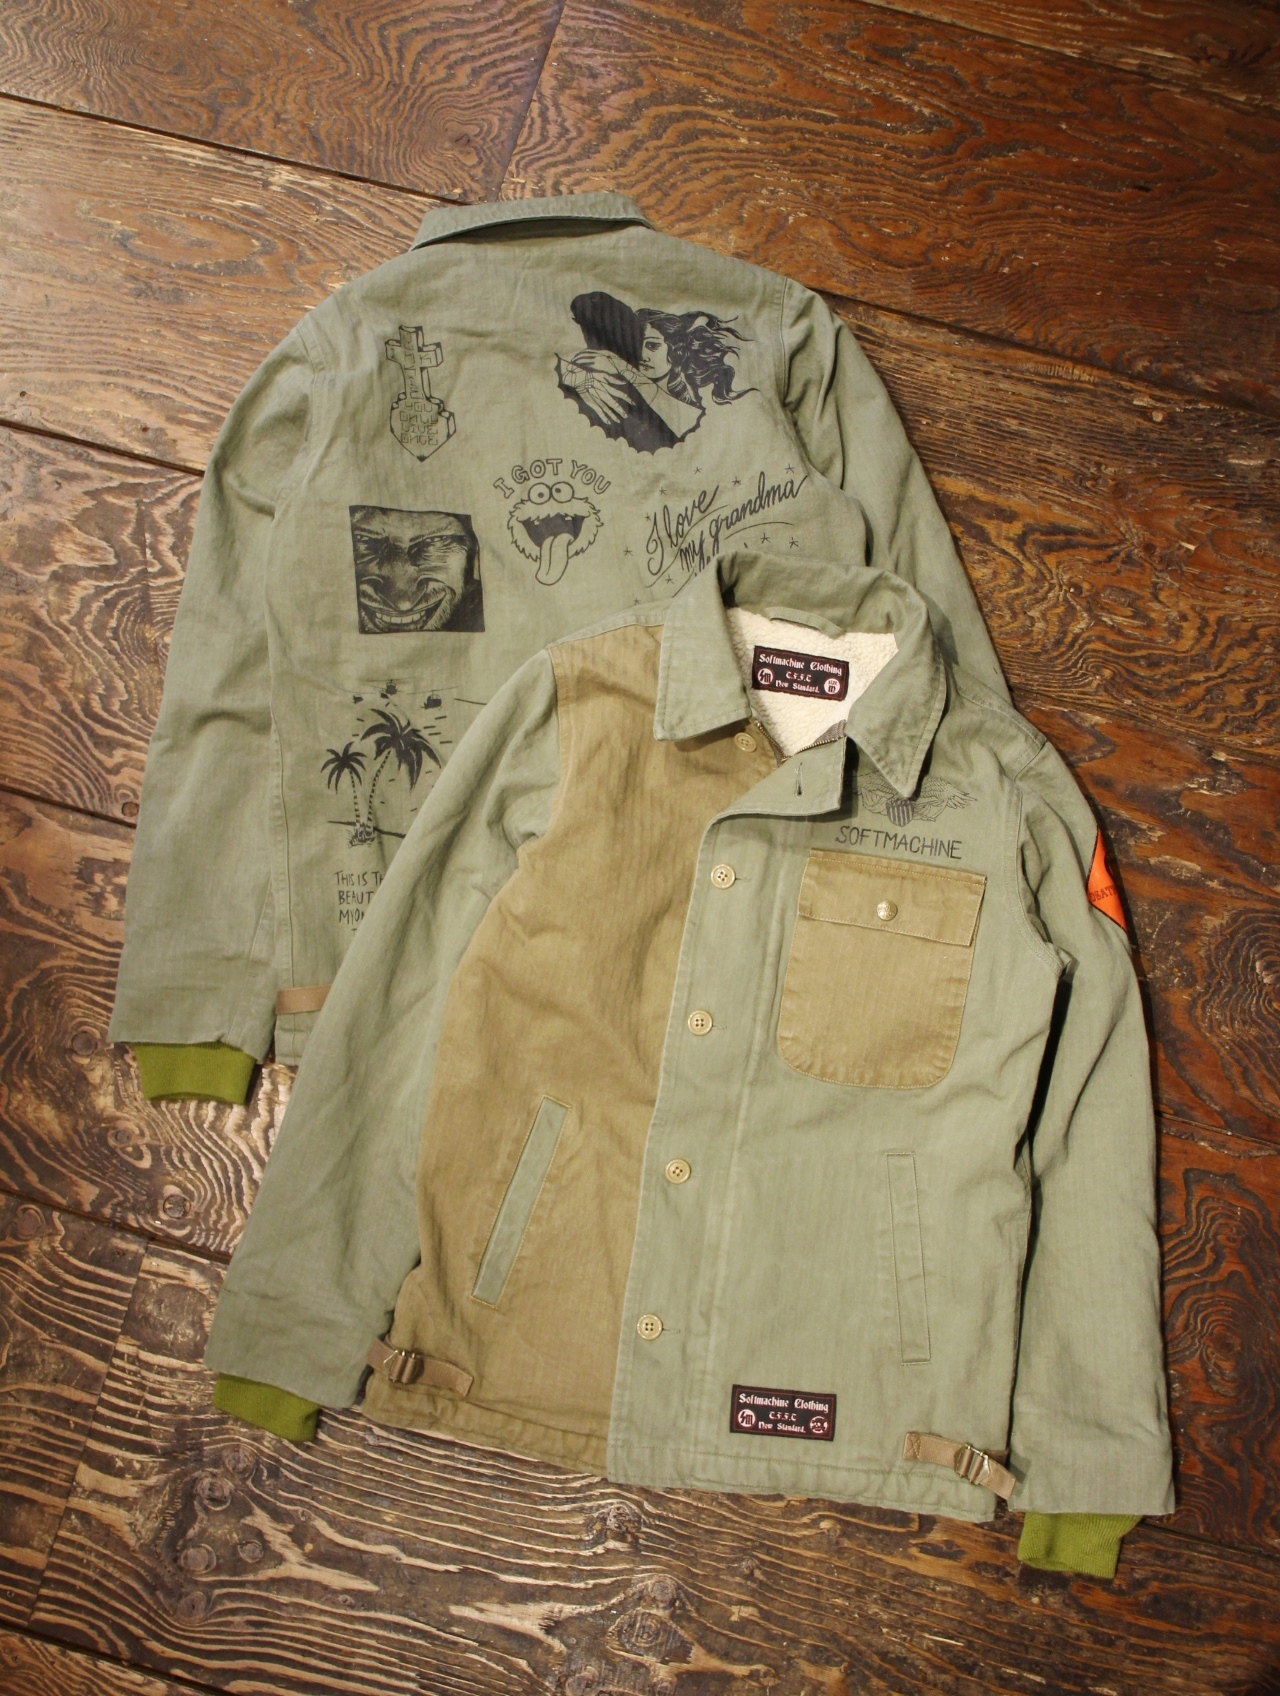 SOFTMACHINE   「 COMPIlATION JK 」  A-2 タイプデッキジャケット